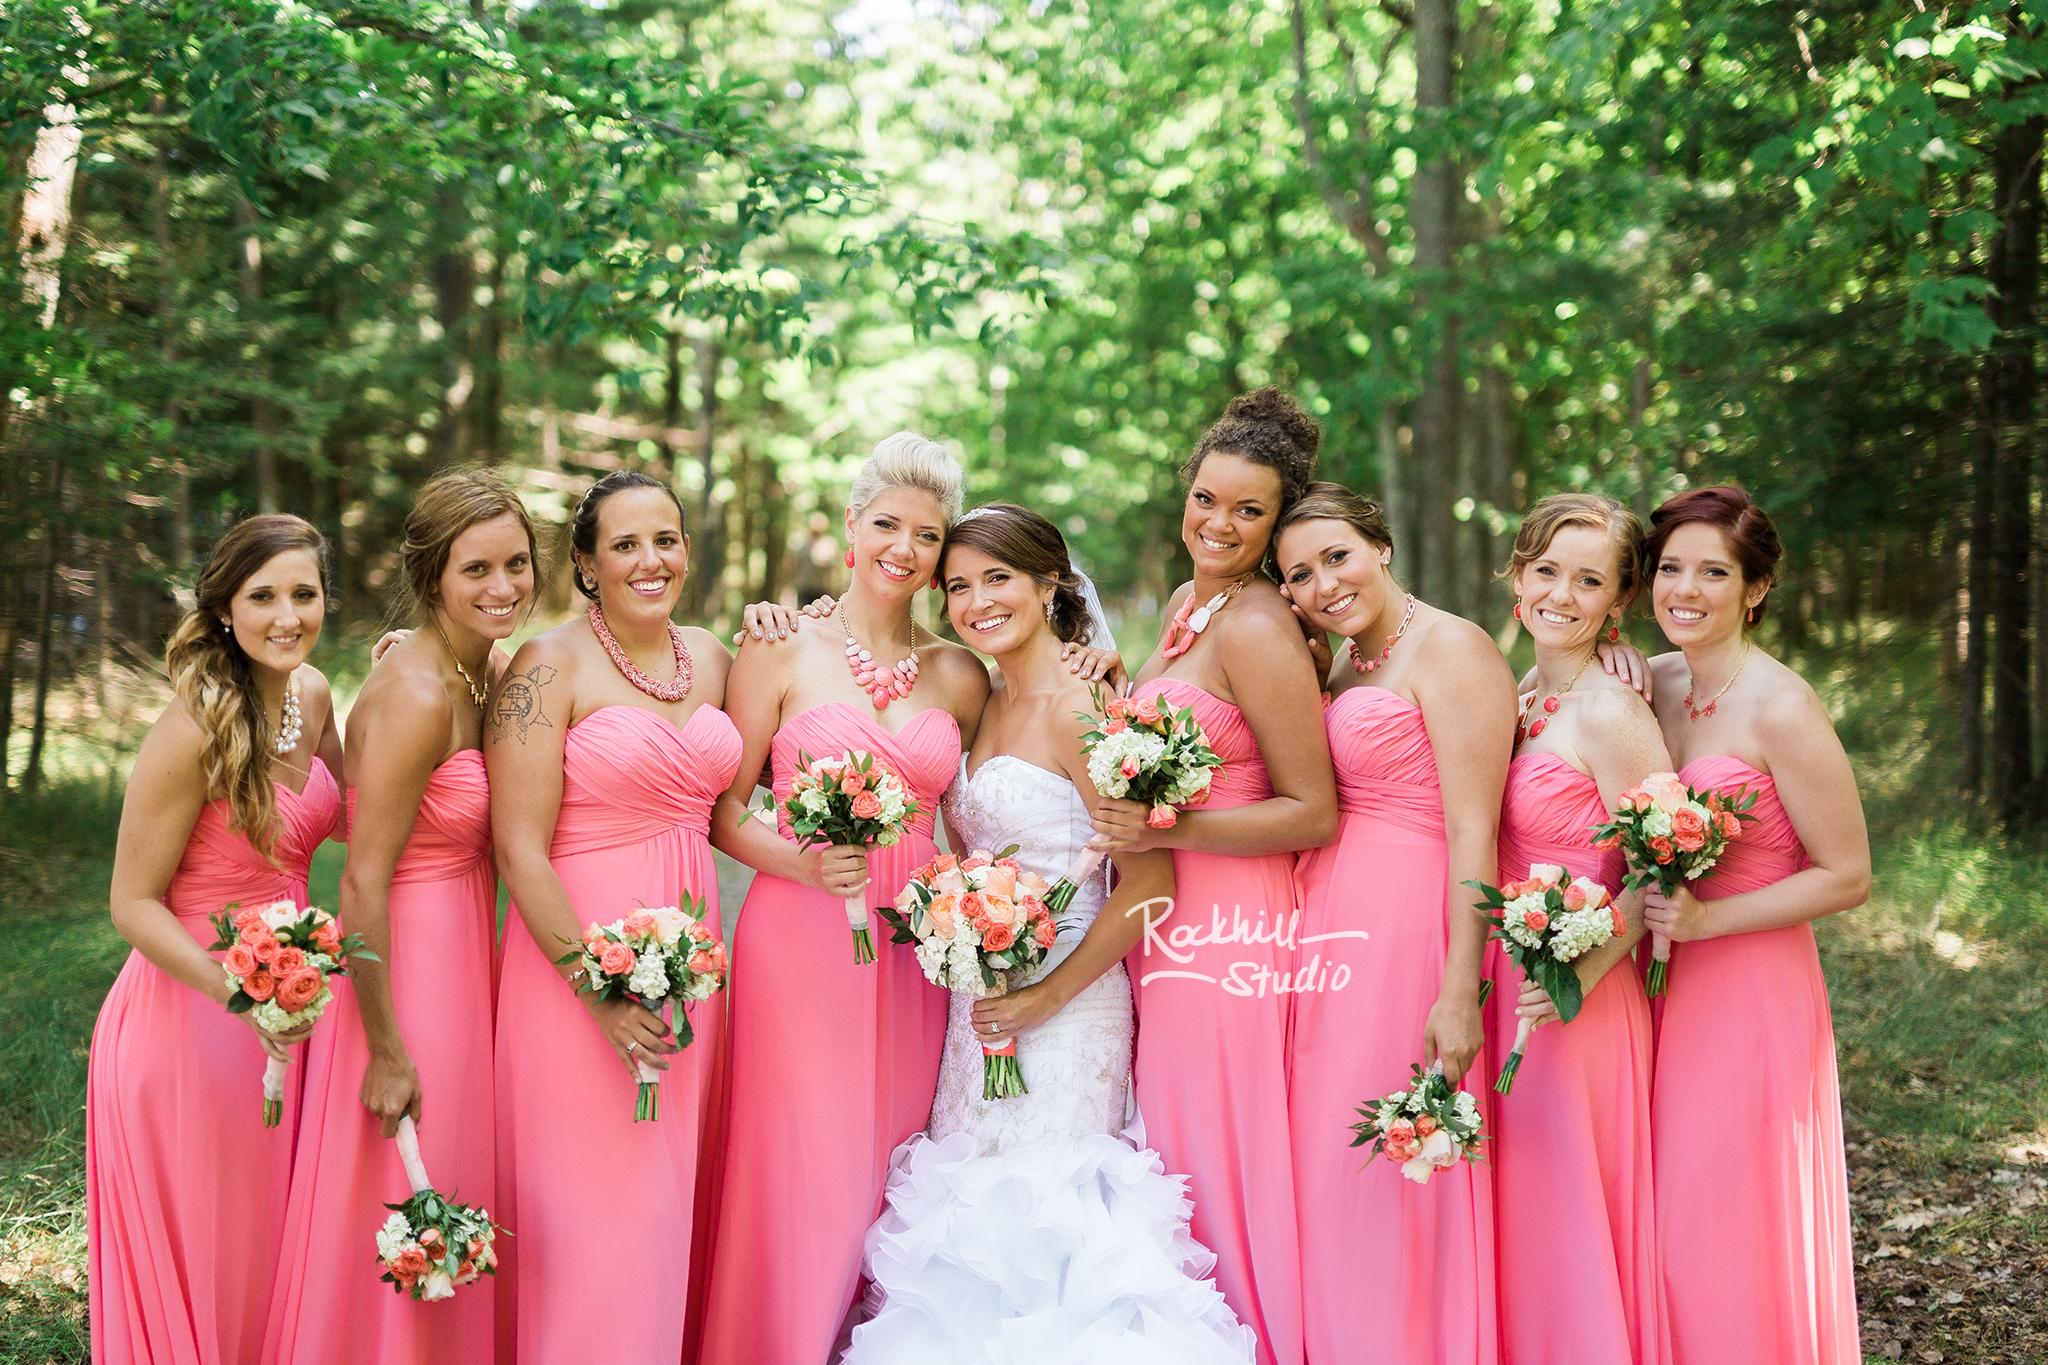 traverse-city-wedding-photographer-destination-michigan-ck-1